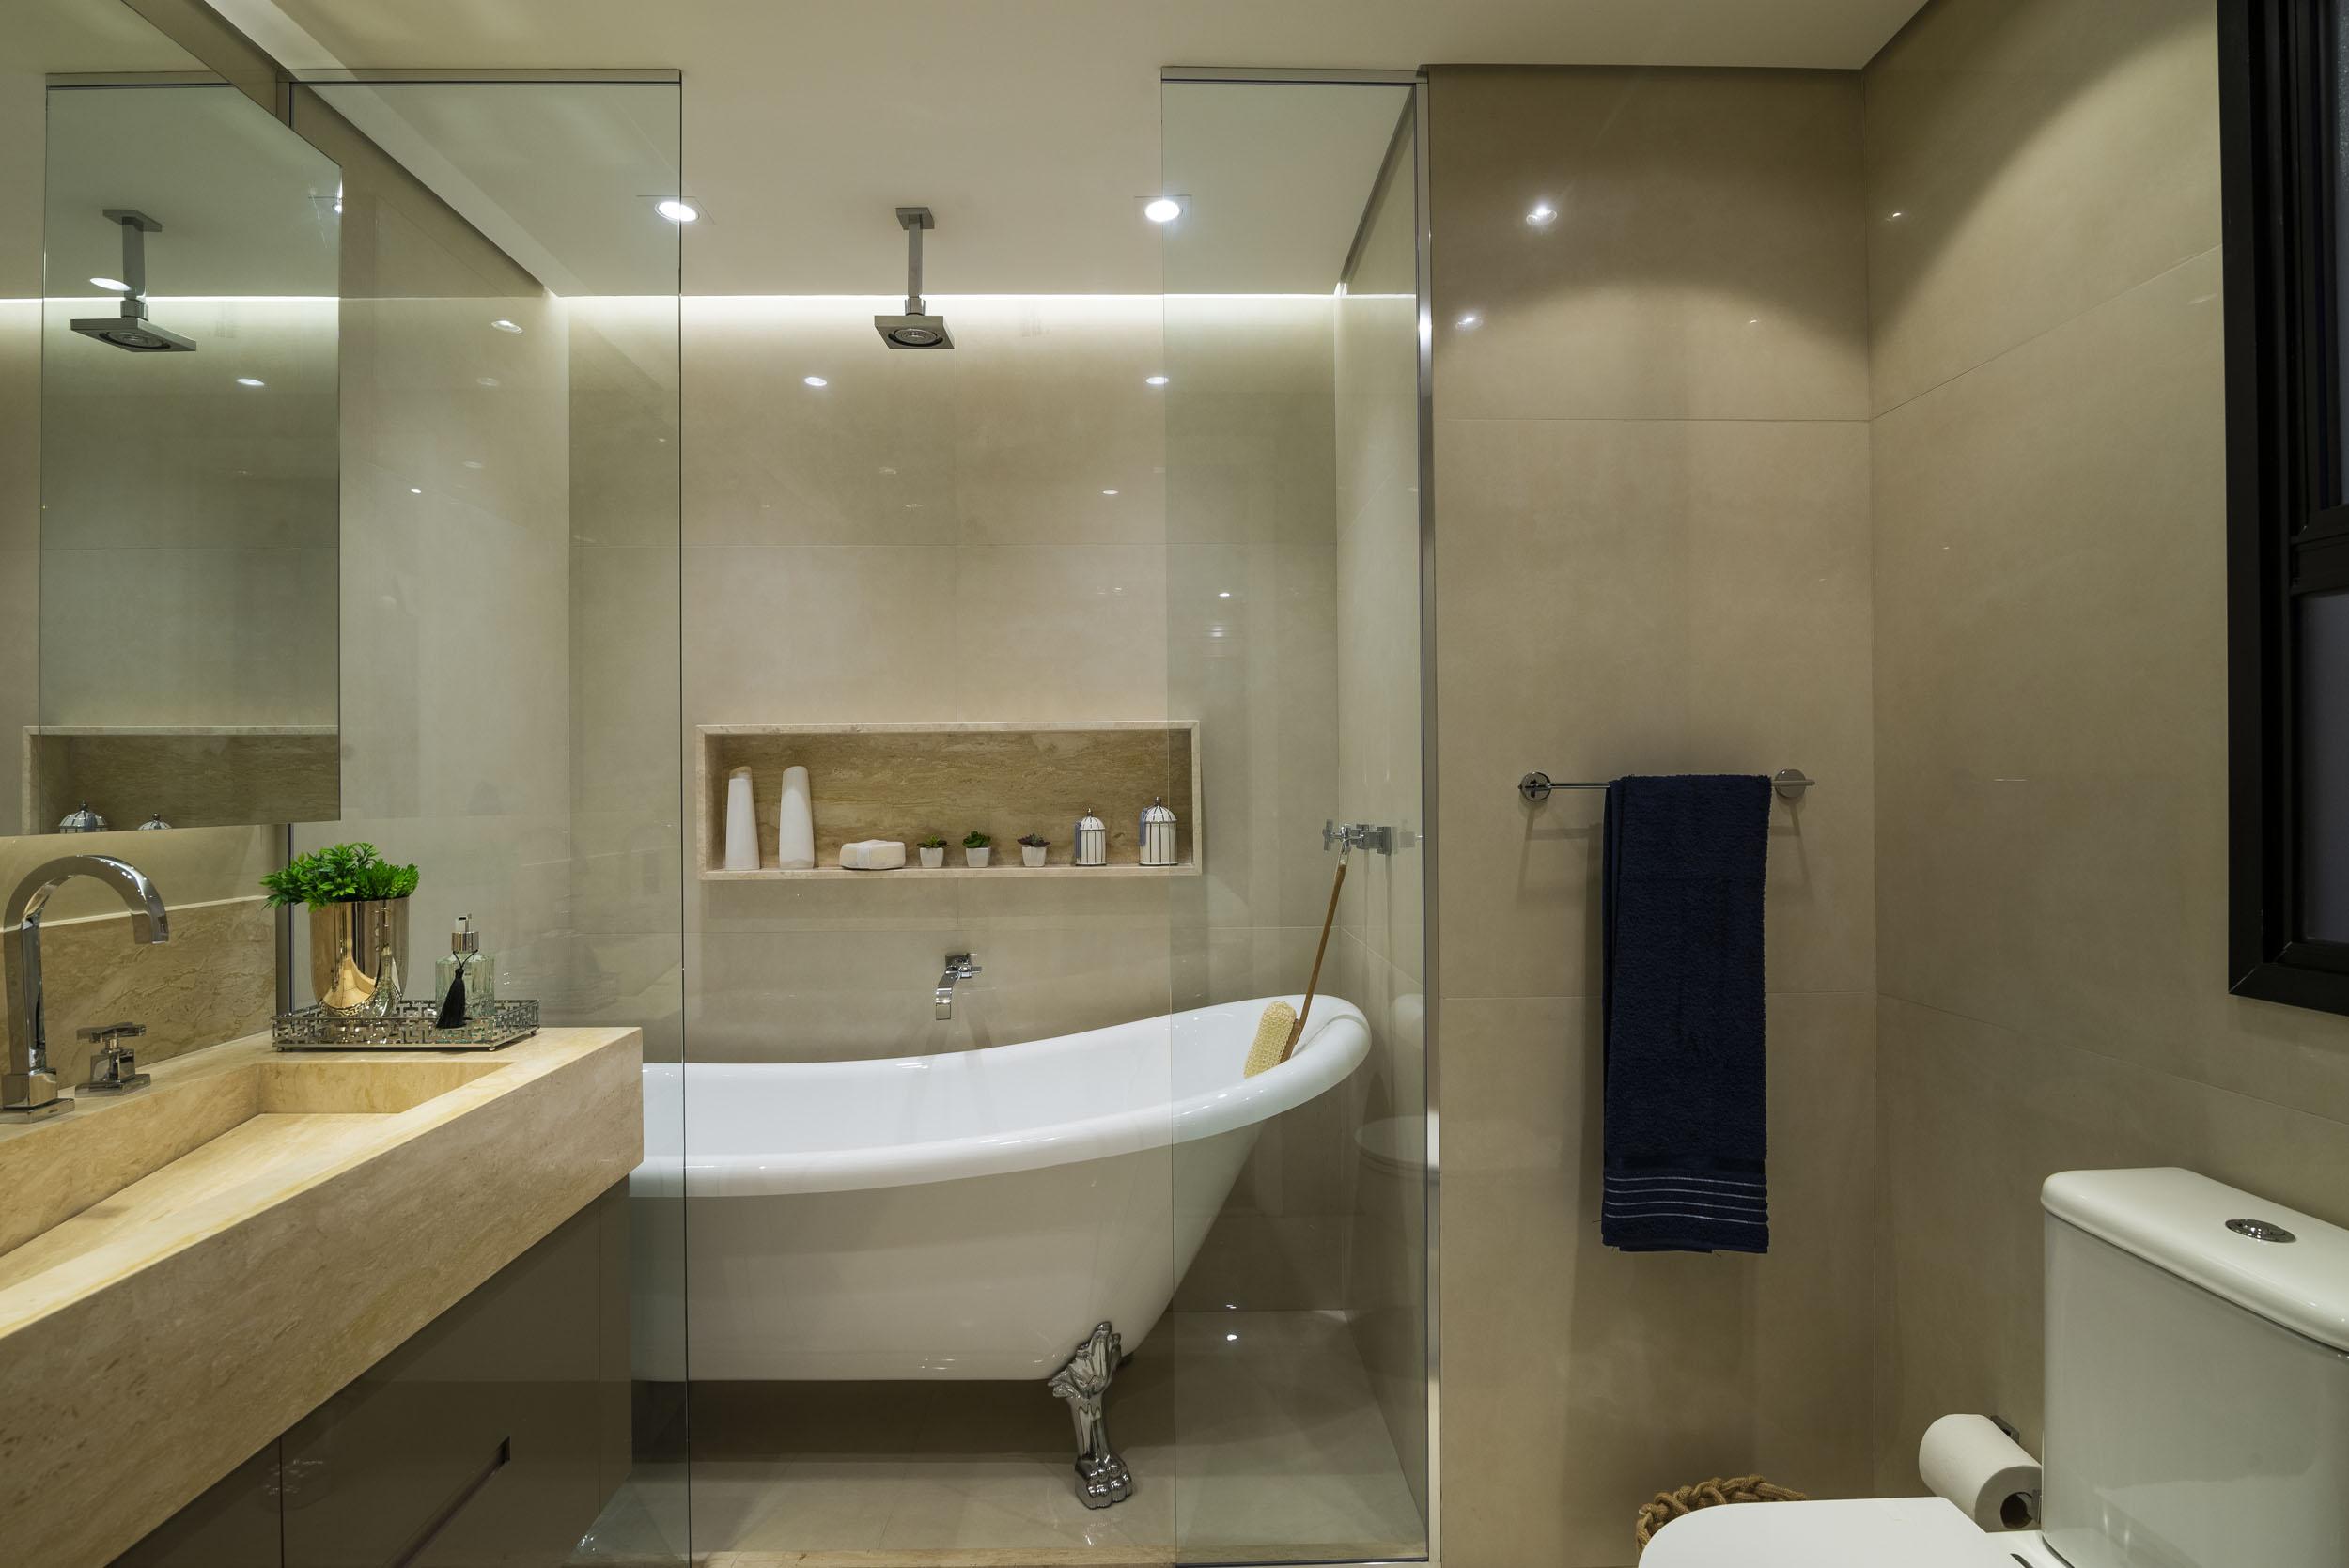 Decorado Banheiro 1300 Jurupis